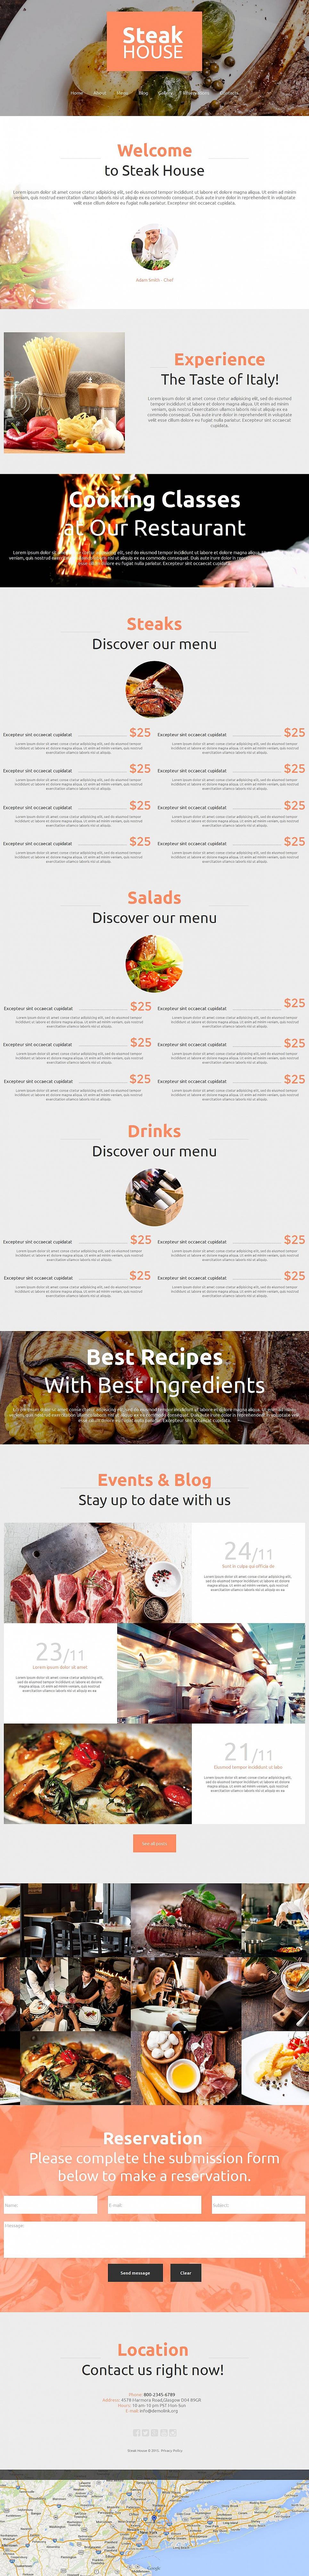 MotoCMS HTML Шаблон #53234 из категории Кафе и рестораны - image